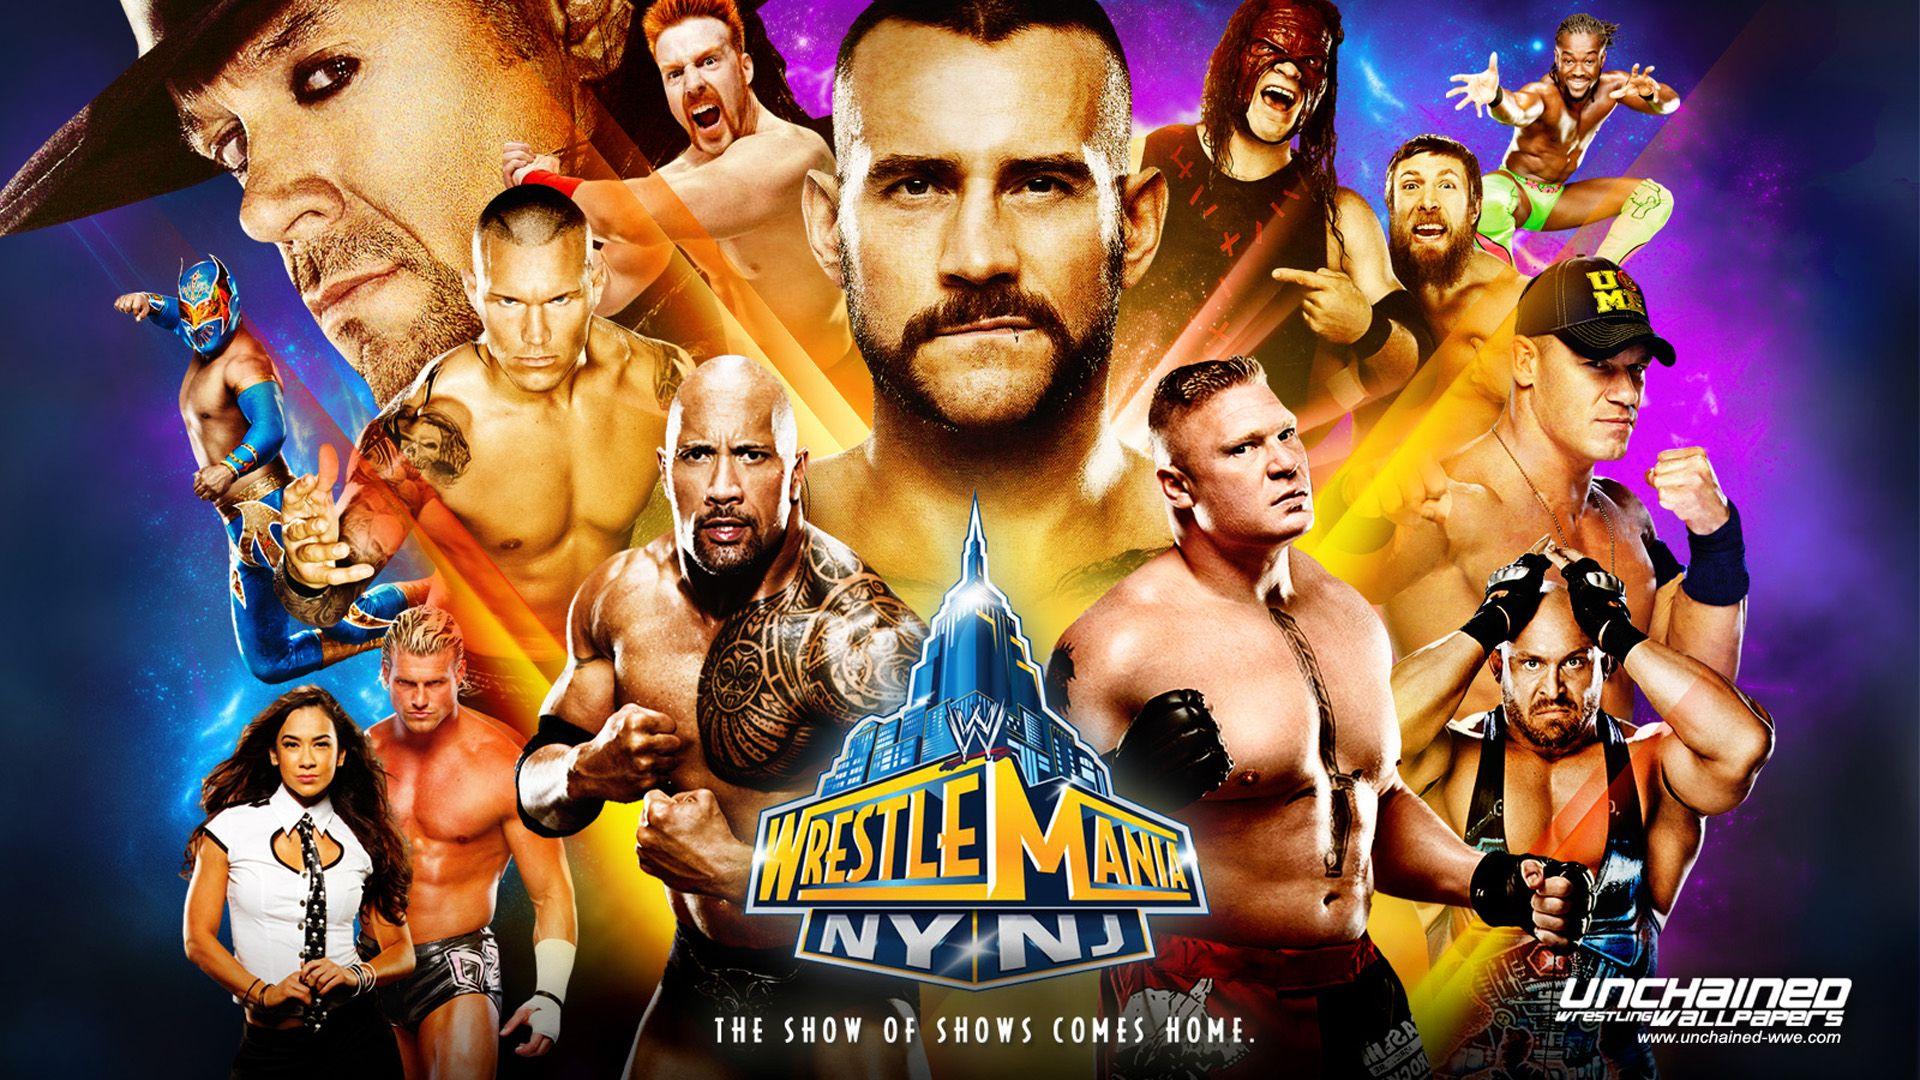 wrestlemania 29 full show download mp4